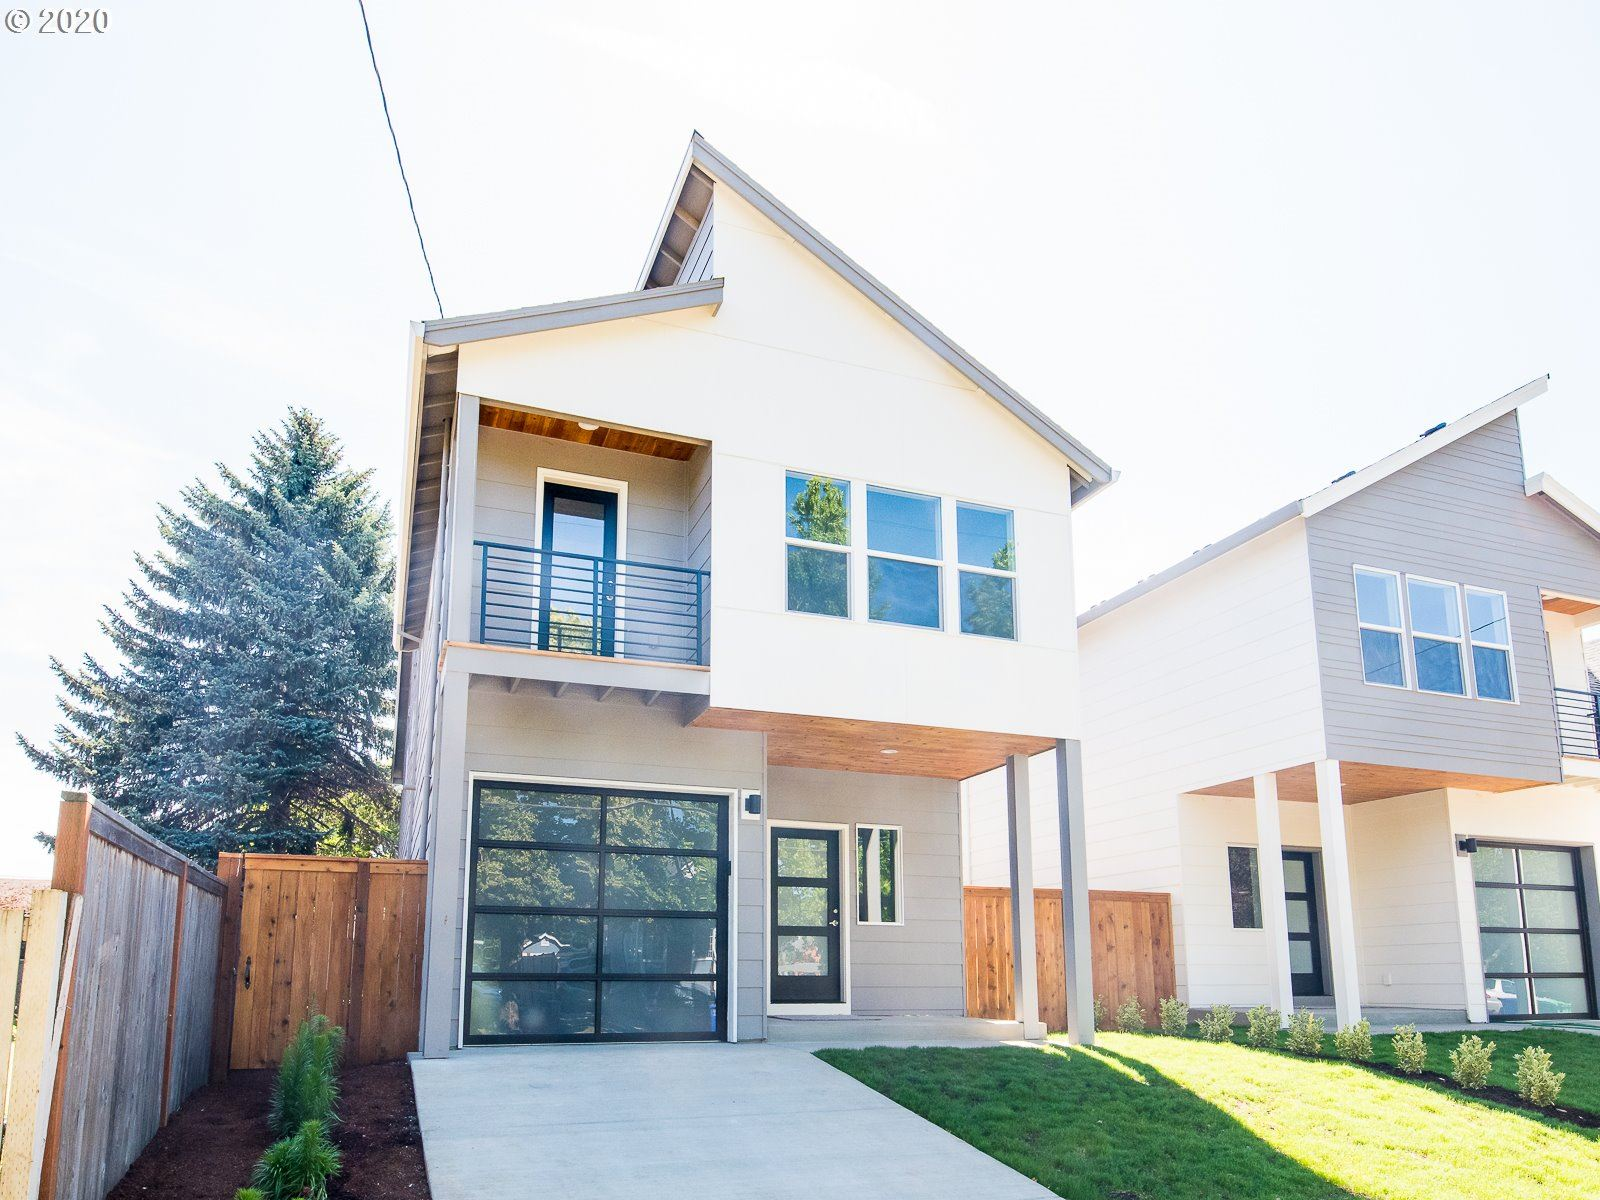 420 NE 76TH AVE, Portland, OR 97213 - MLS#: 21397303